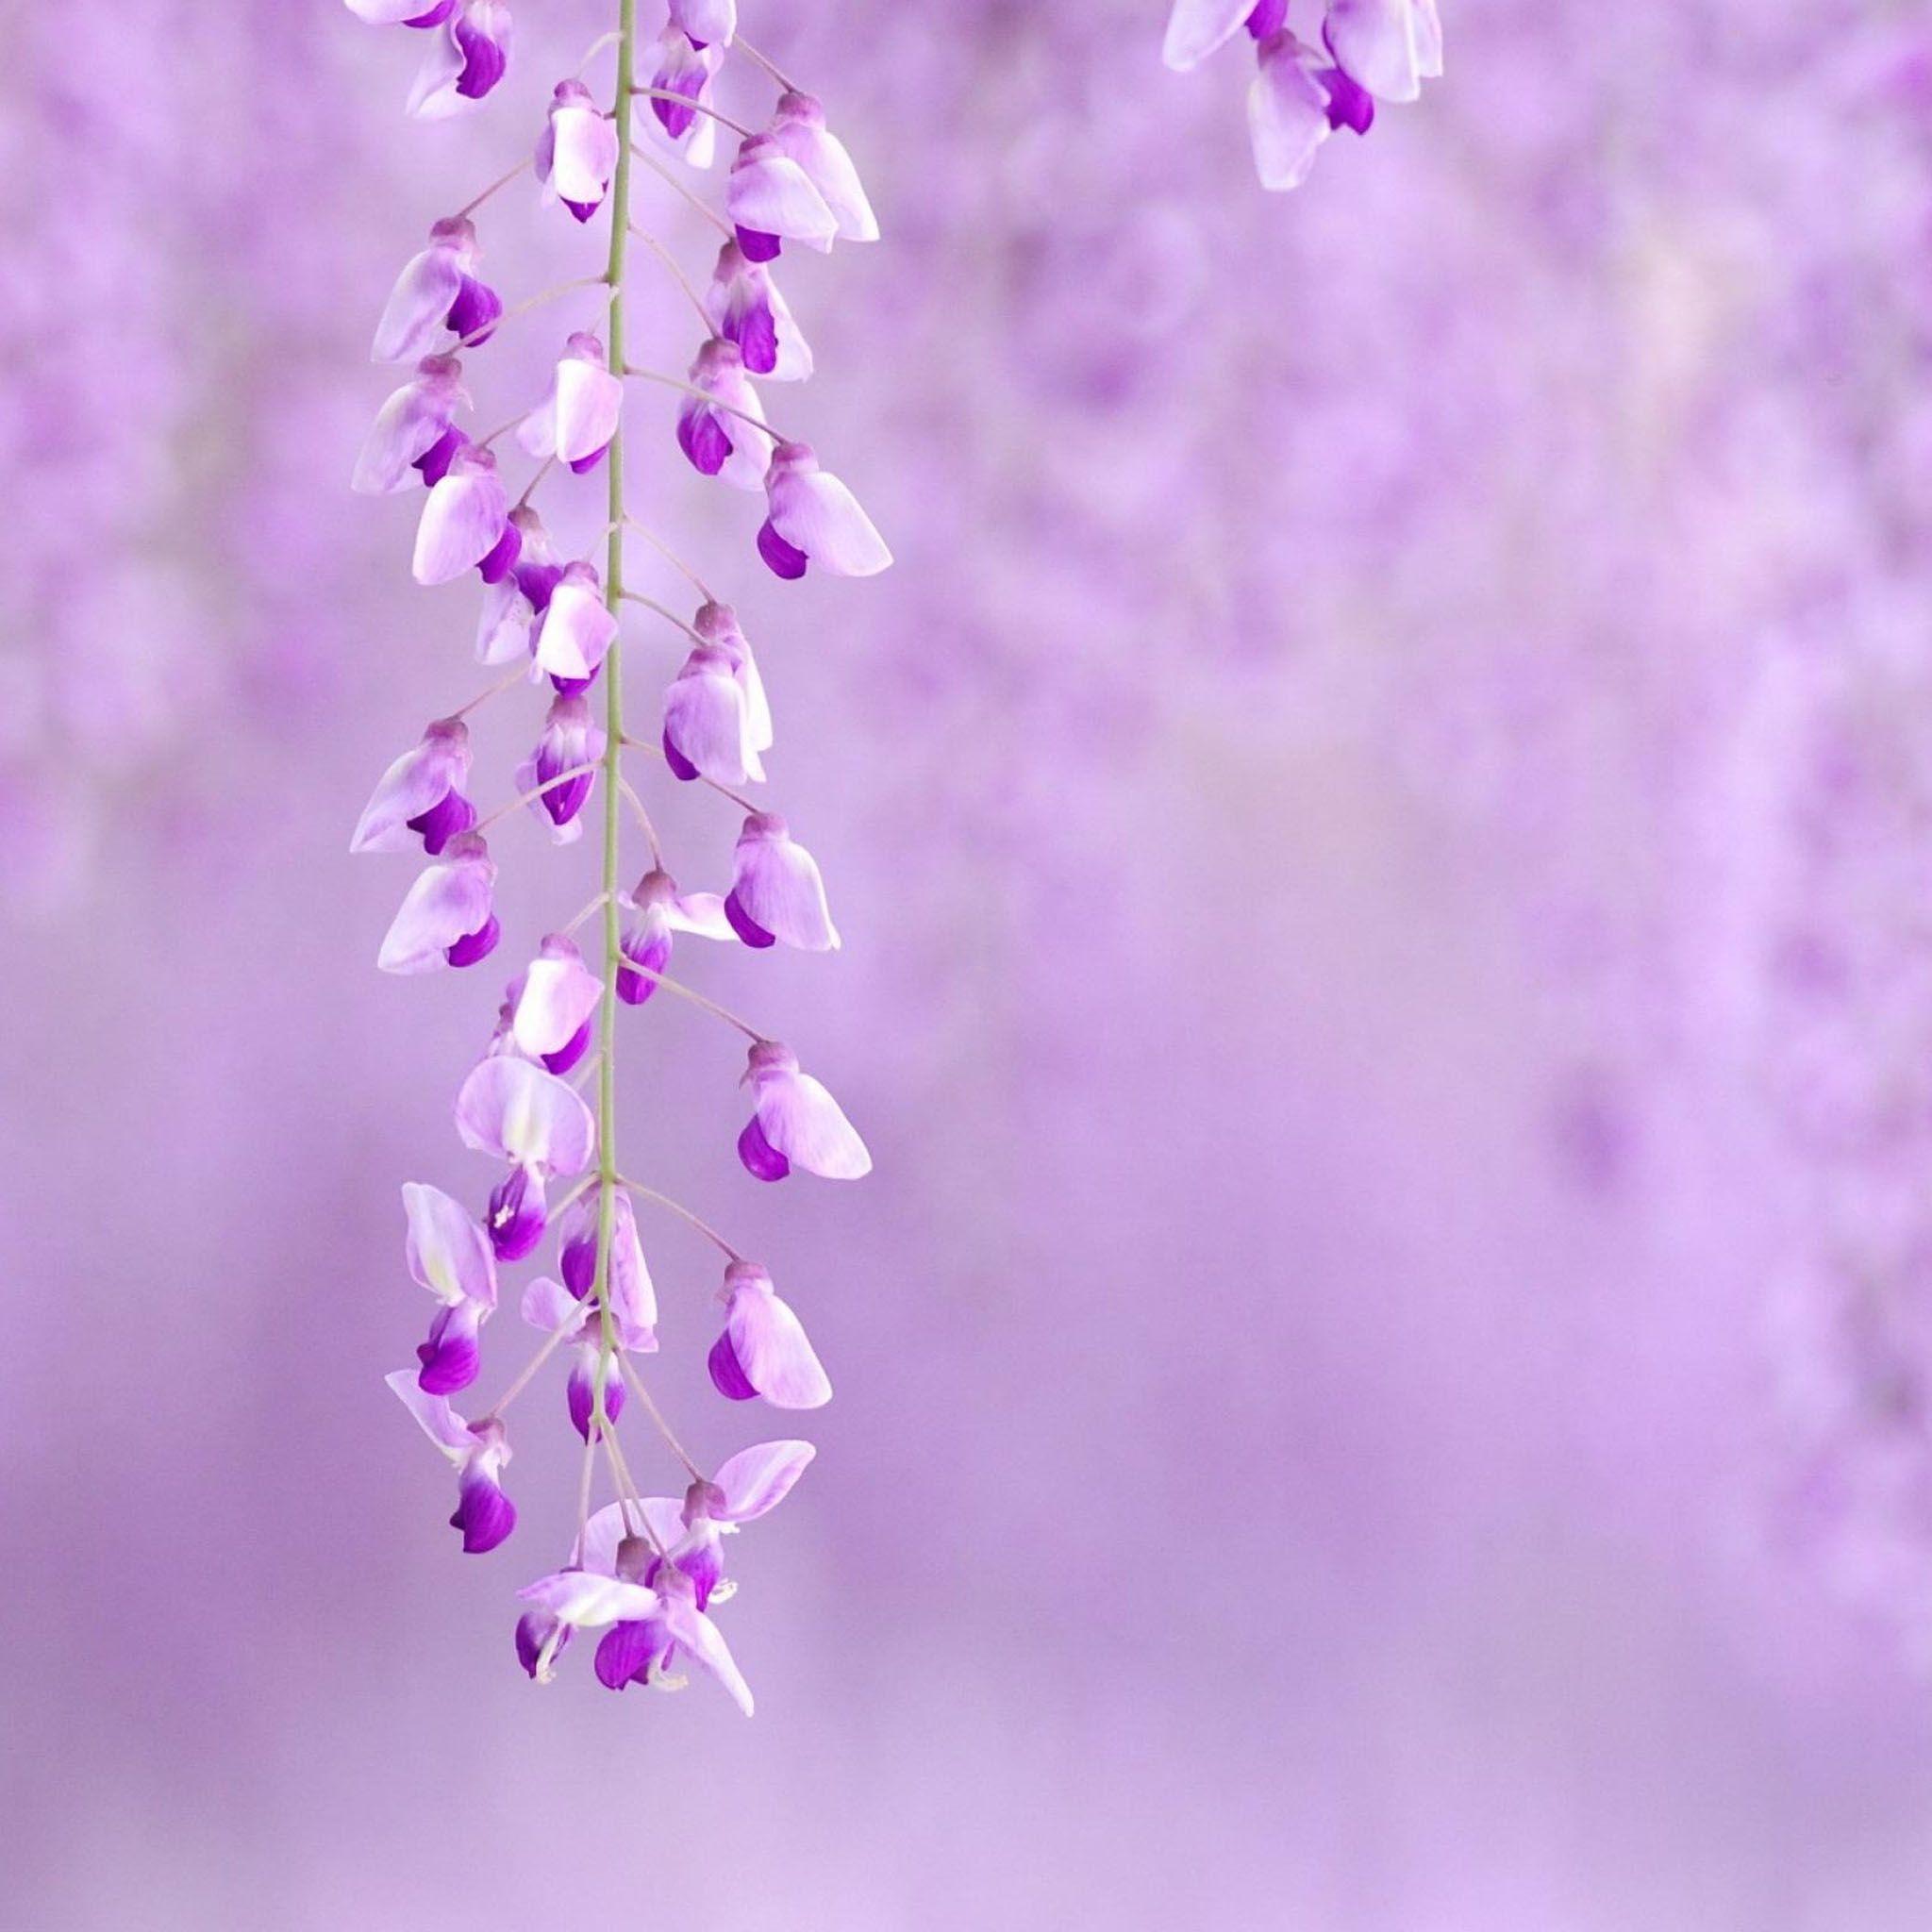 Free Ppt Backgrounds Desktop Wallpaper Flower Pink Lotus: Pin By Art On Visualosities